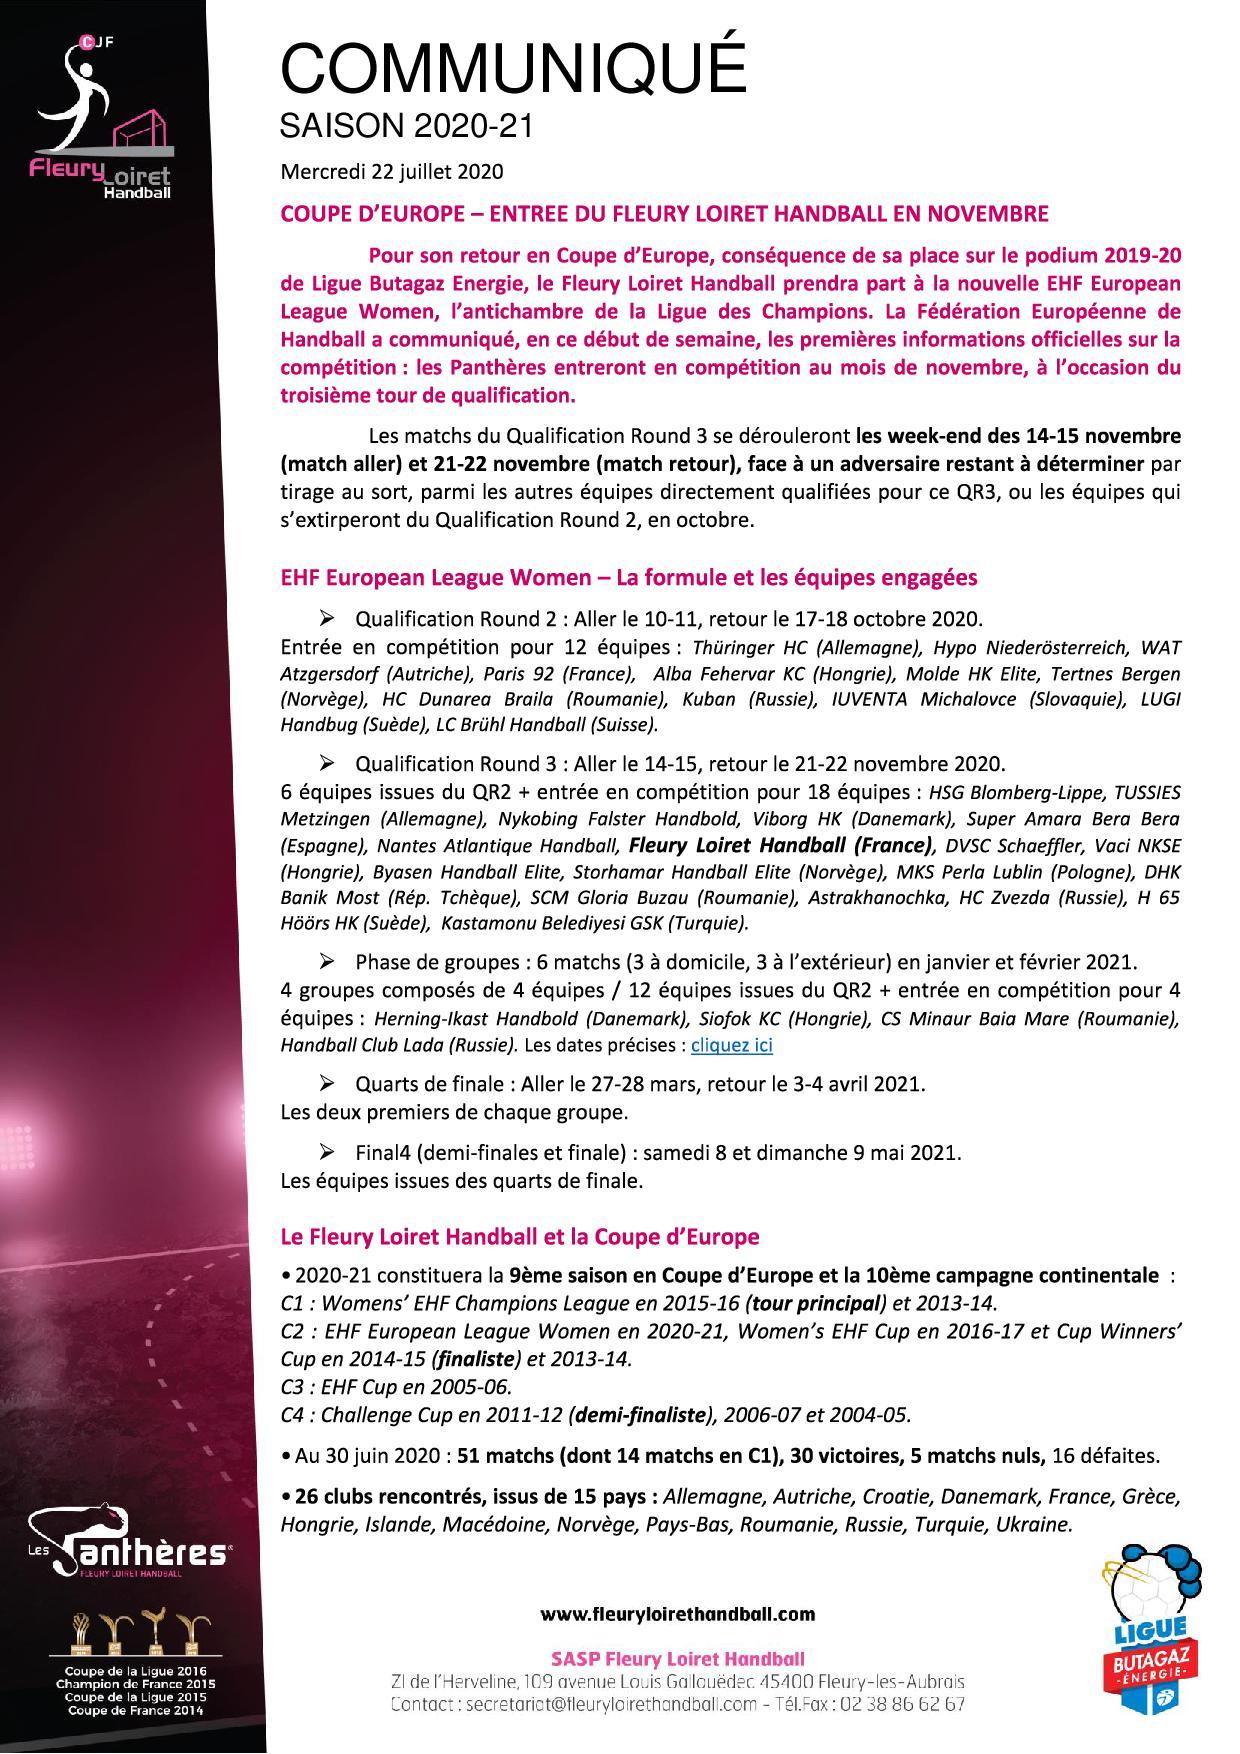 Communiqué Fleury Loiret Handball - Mercredi 22 juillet 2020.jpg